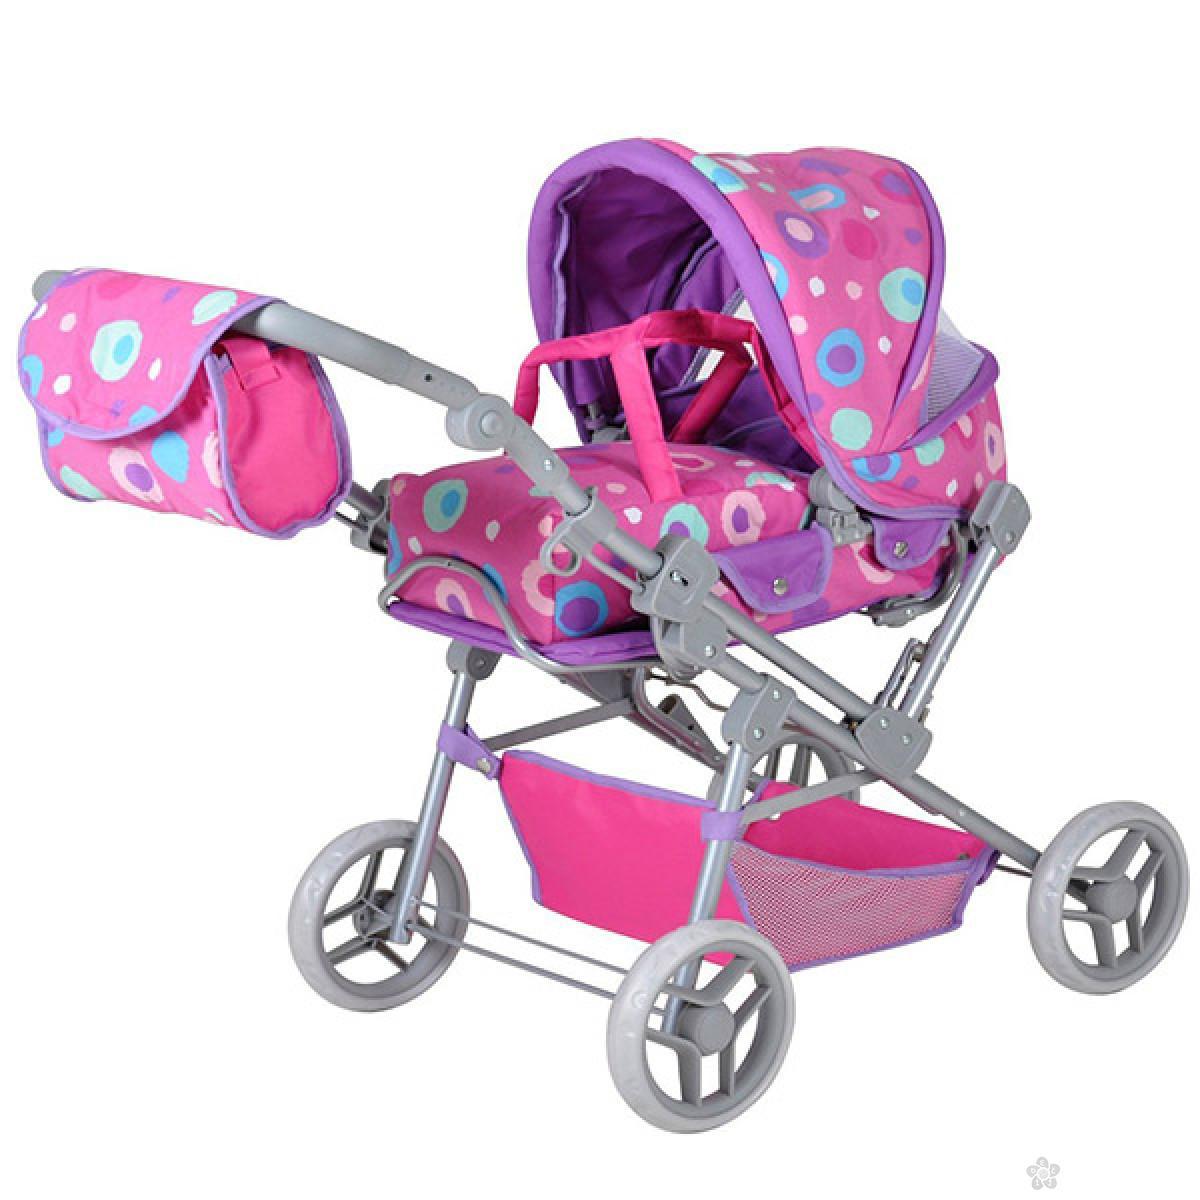 Kolica za lutke Knorr Toys Mioux 11415